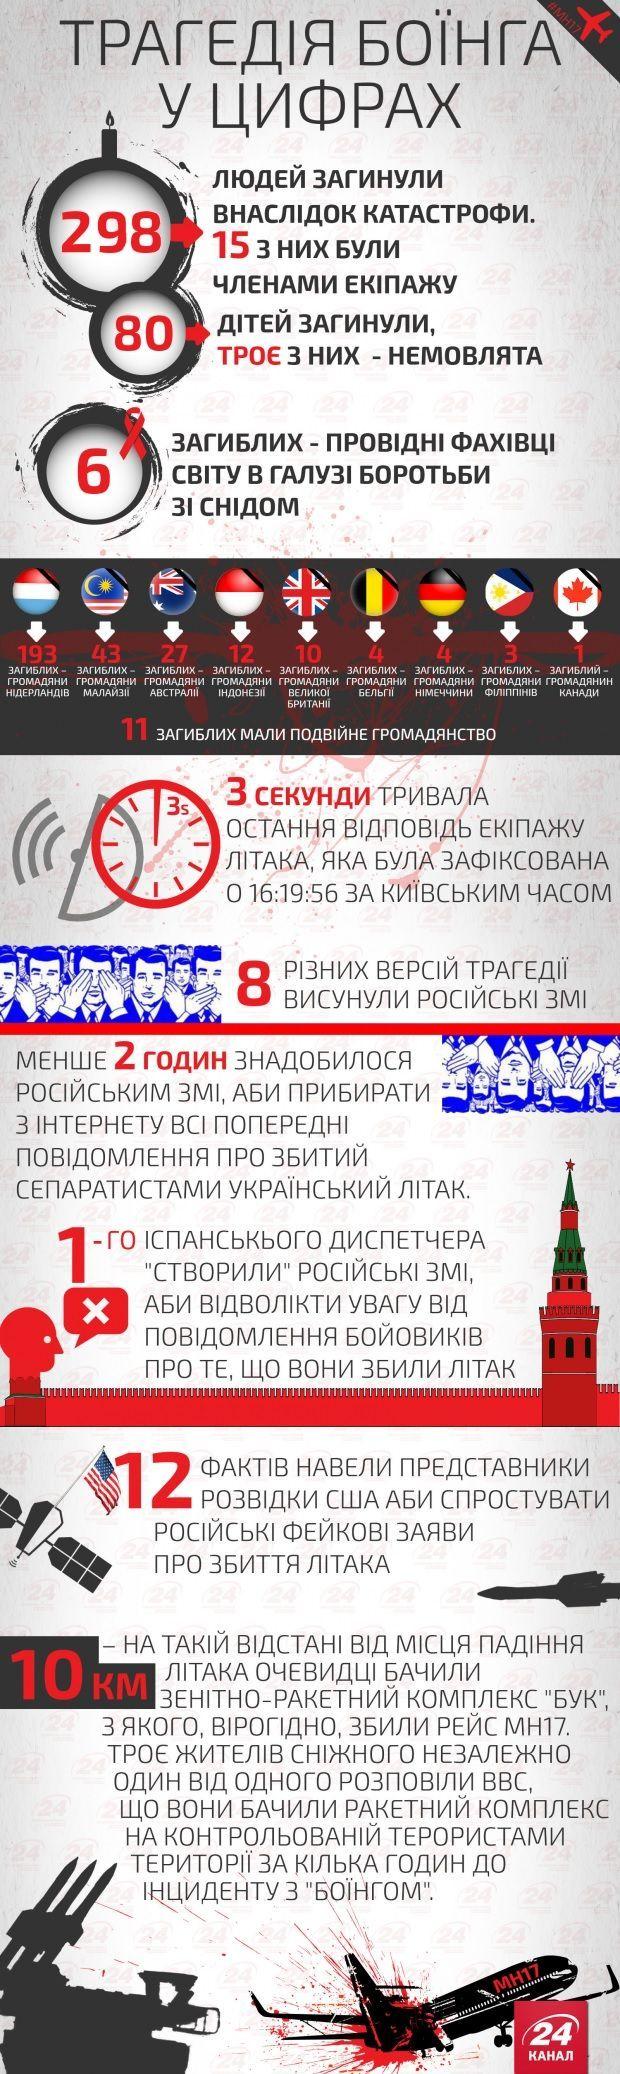 Збиття МН17 у небі над Донбасом